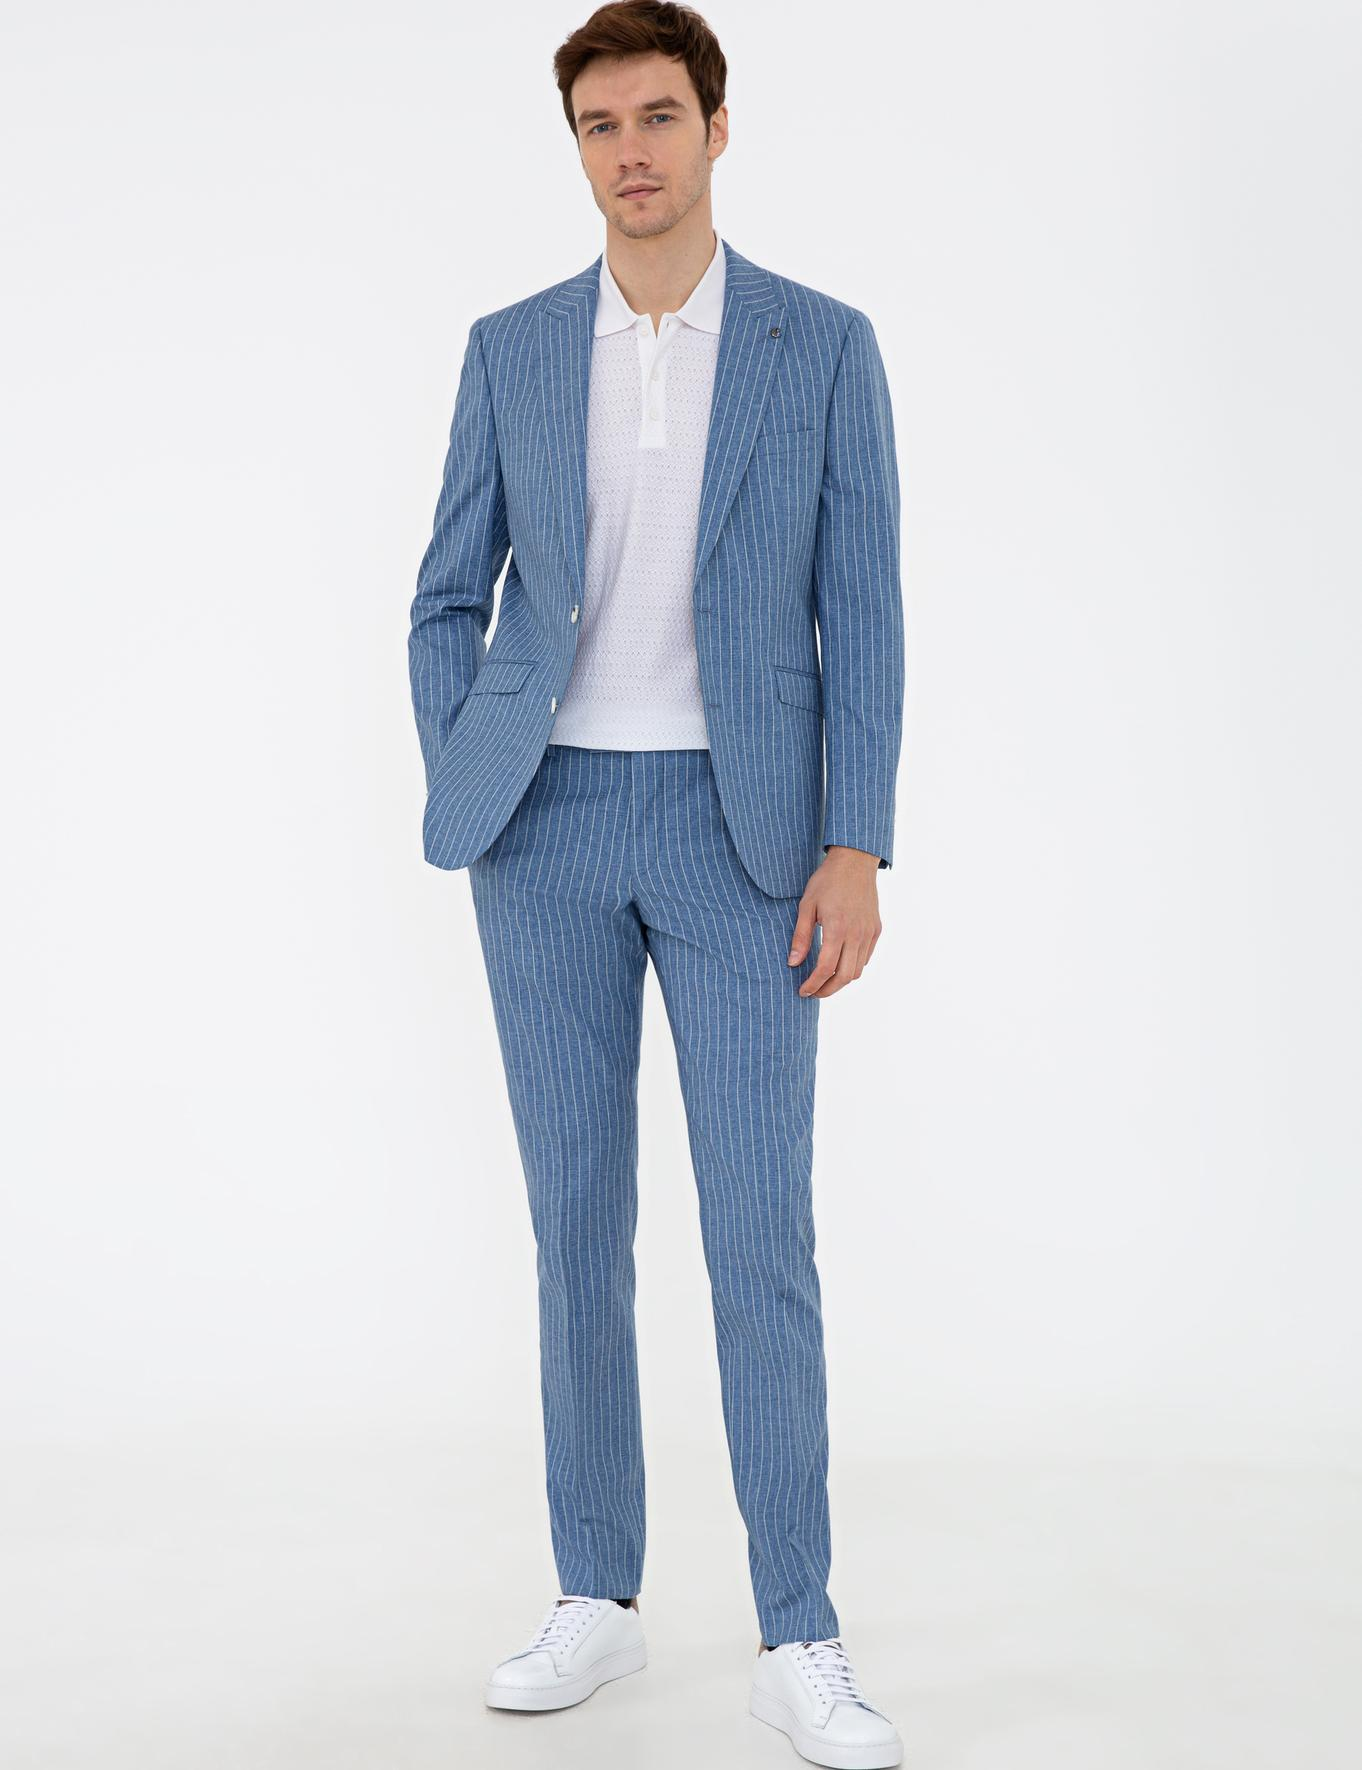 Mavi Slim Fit Takım Elbise - 50237306014